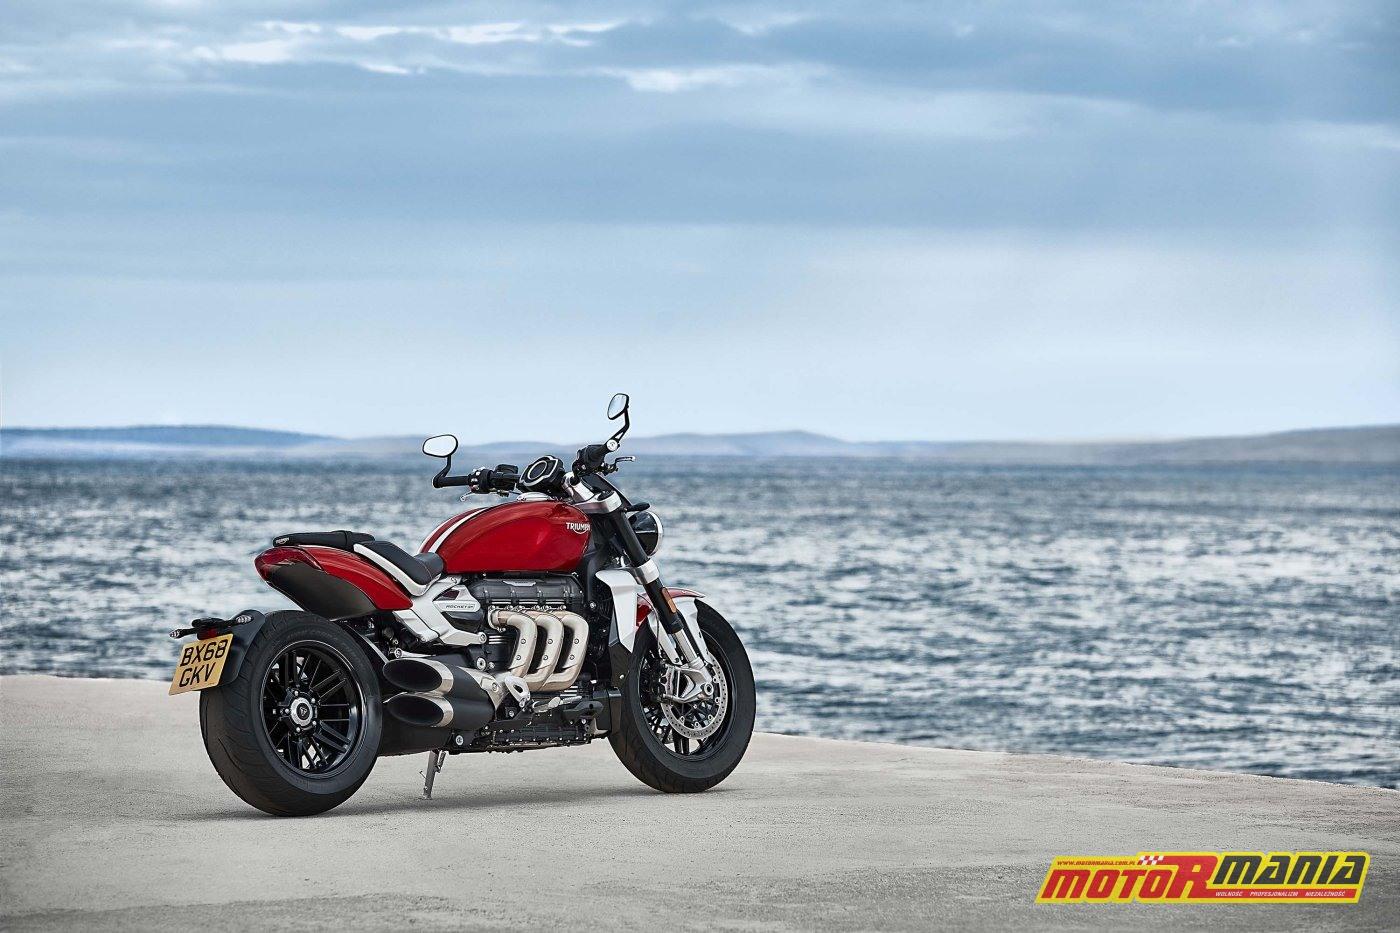 2020 Triumph Rocket 3 R (14)